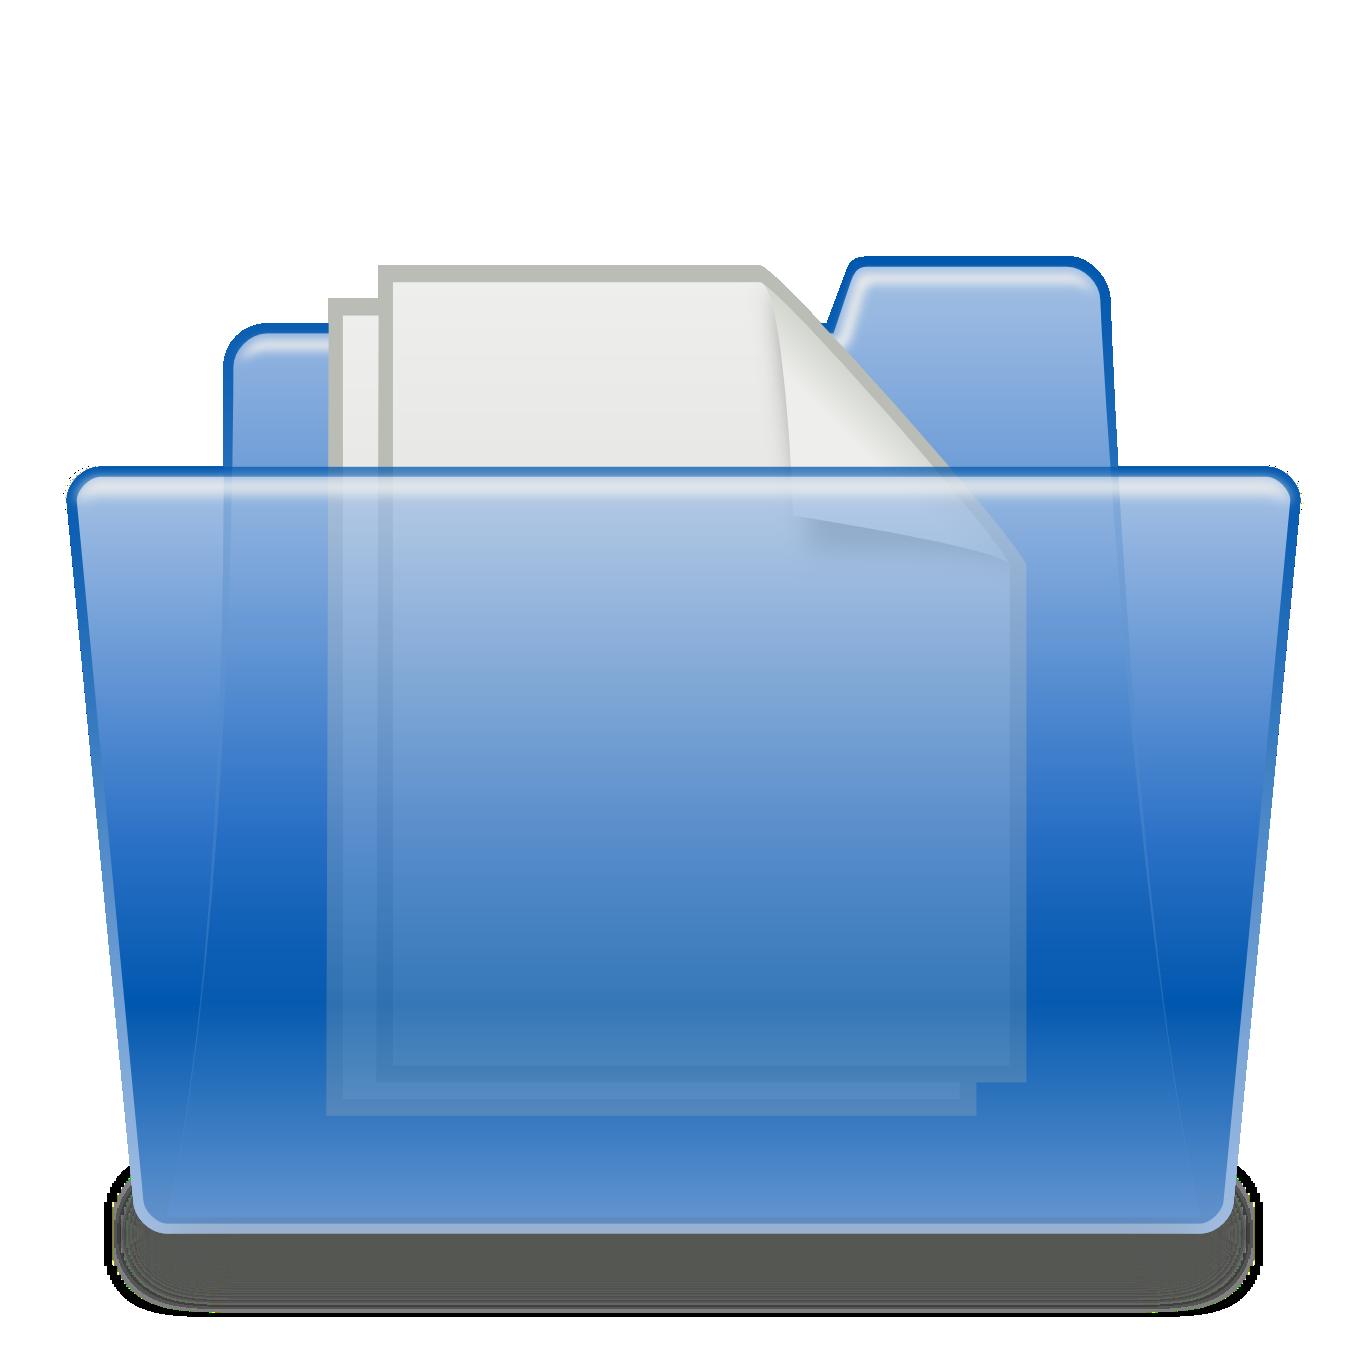 Folders image free download. Windows folder png